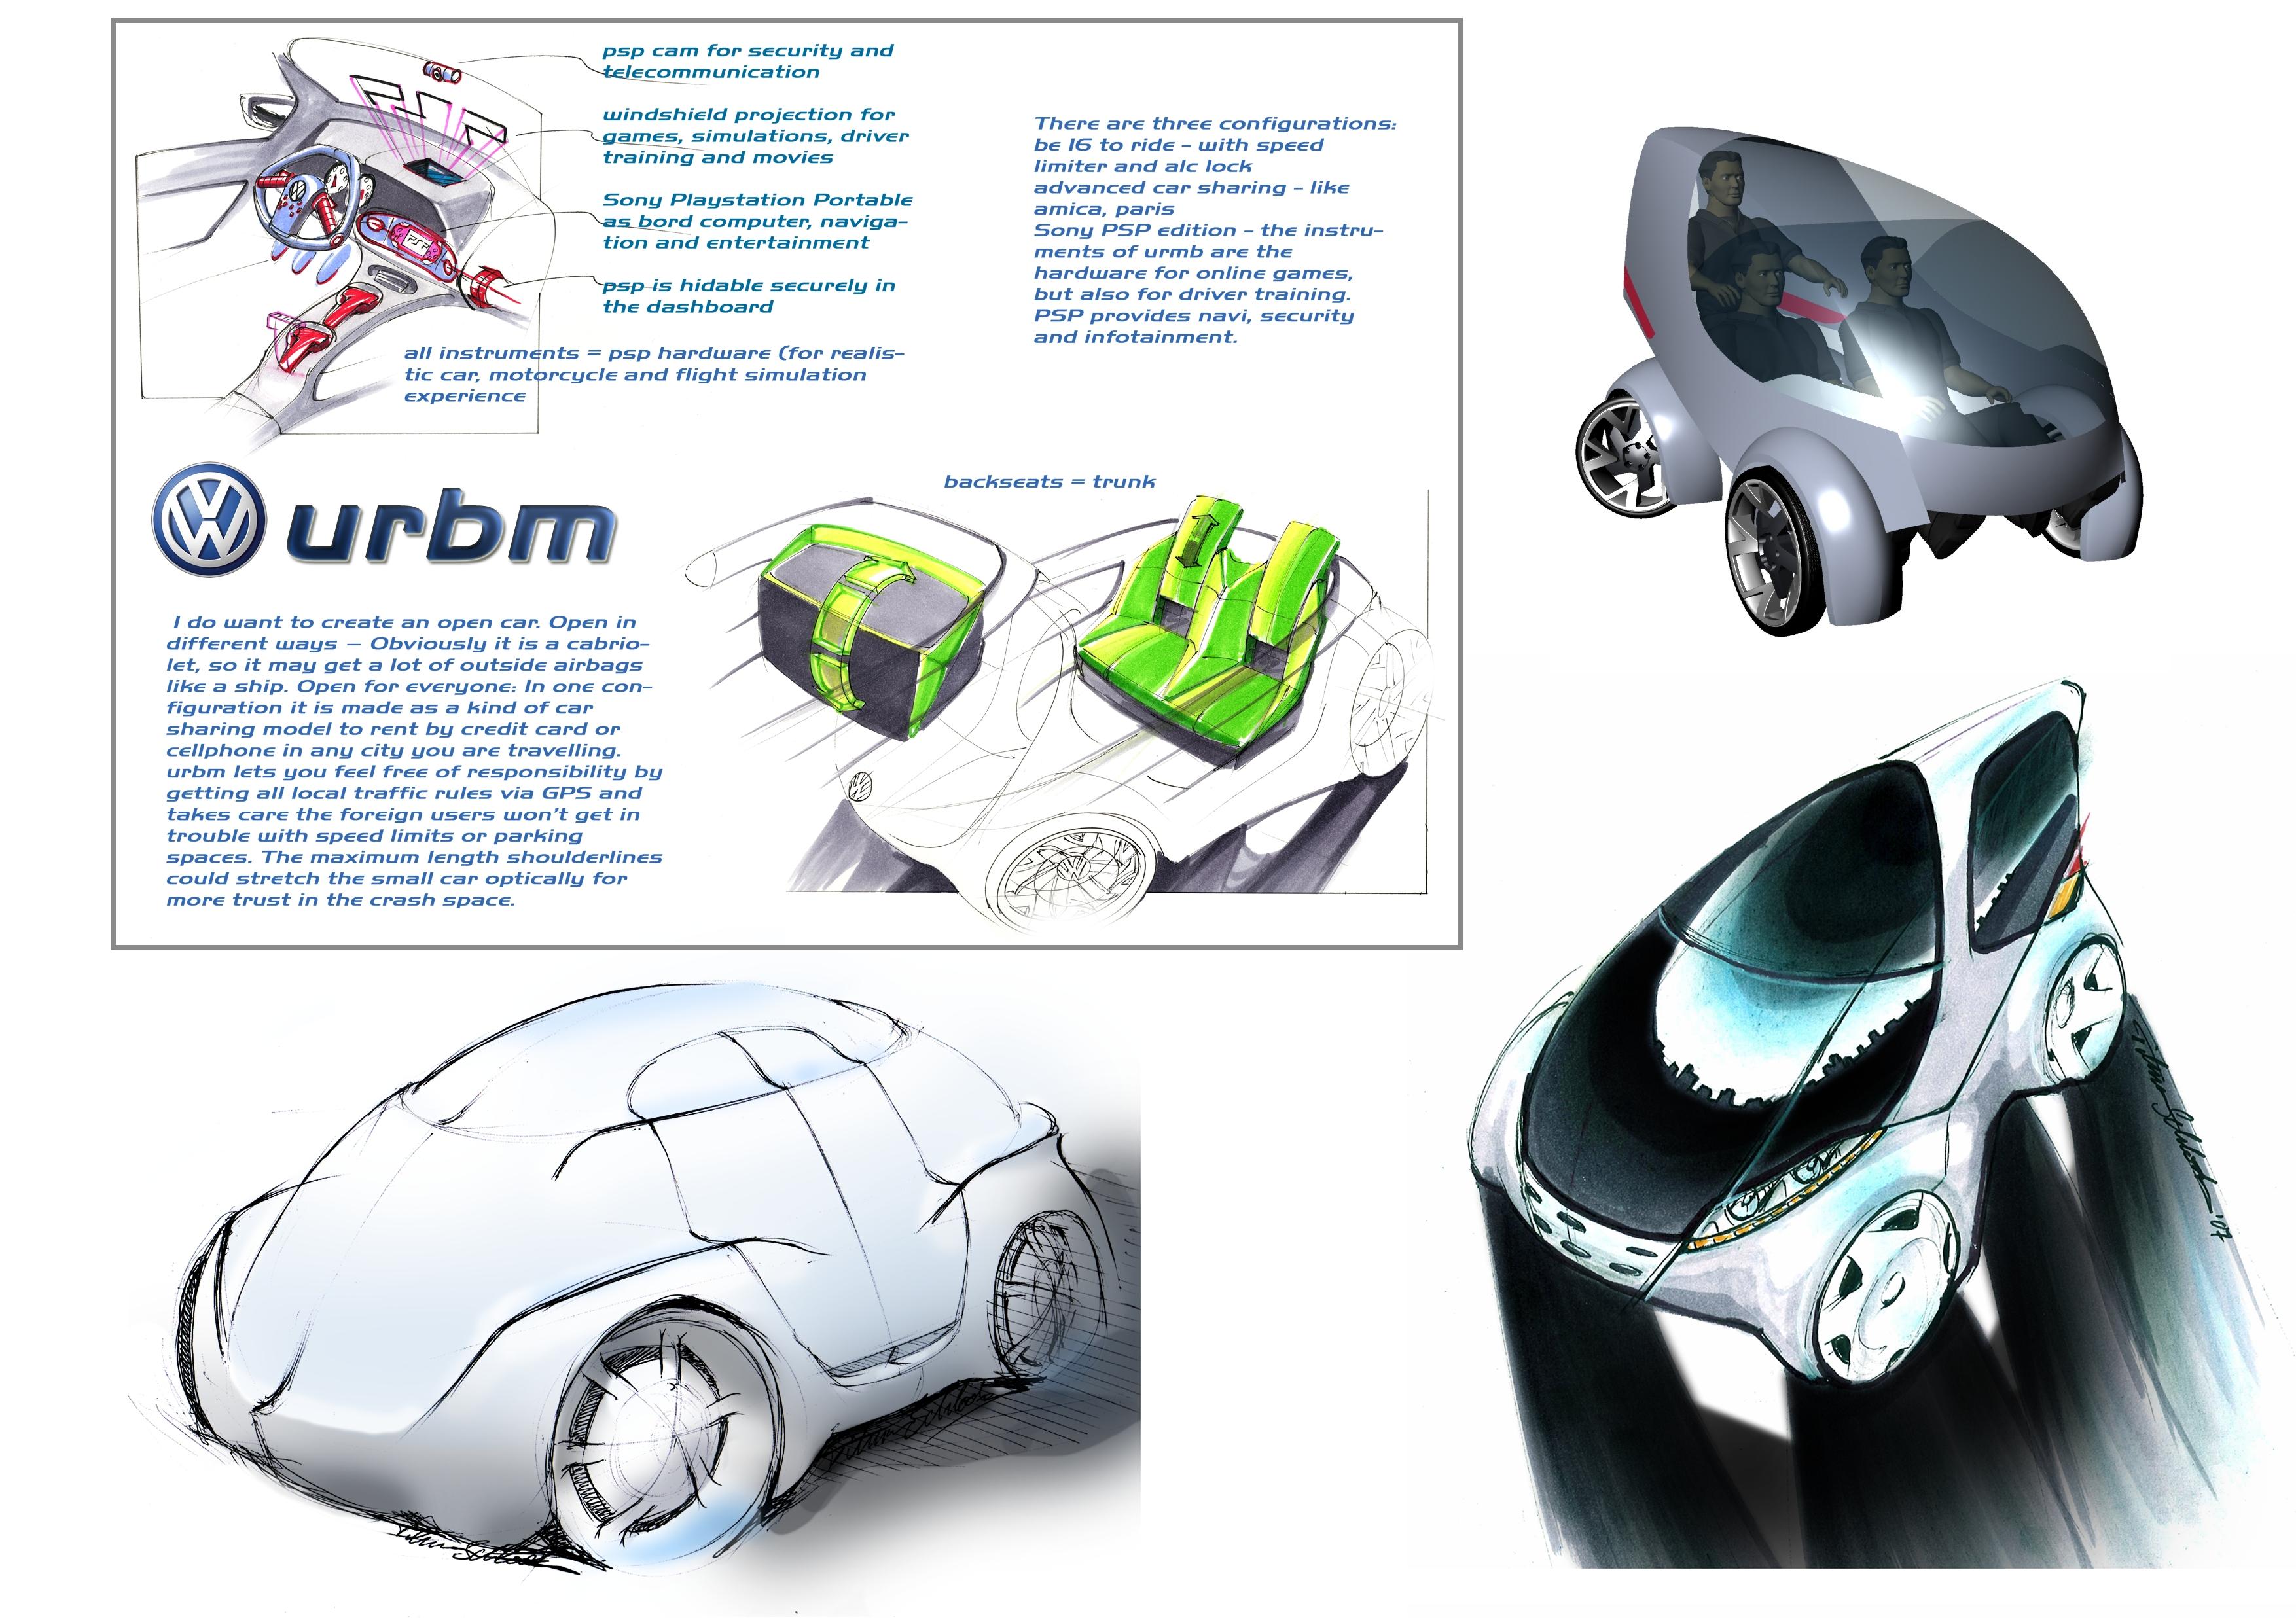 Frankfurt-based-automotive-designer-tilmann-schlootz-design- branding-ux-product-design-VW-volkswagen-future-lab-urban-city-vehicle-concept-Urbm-02